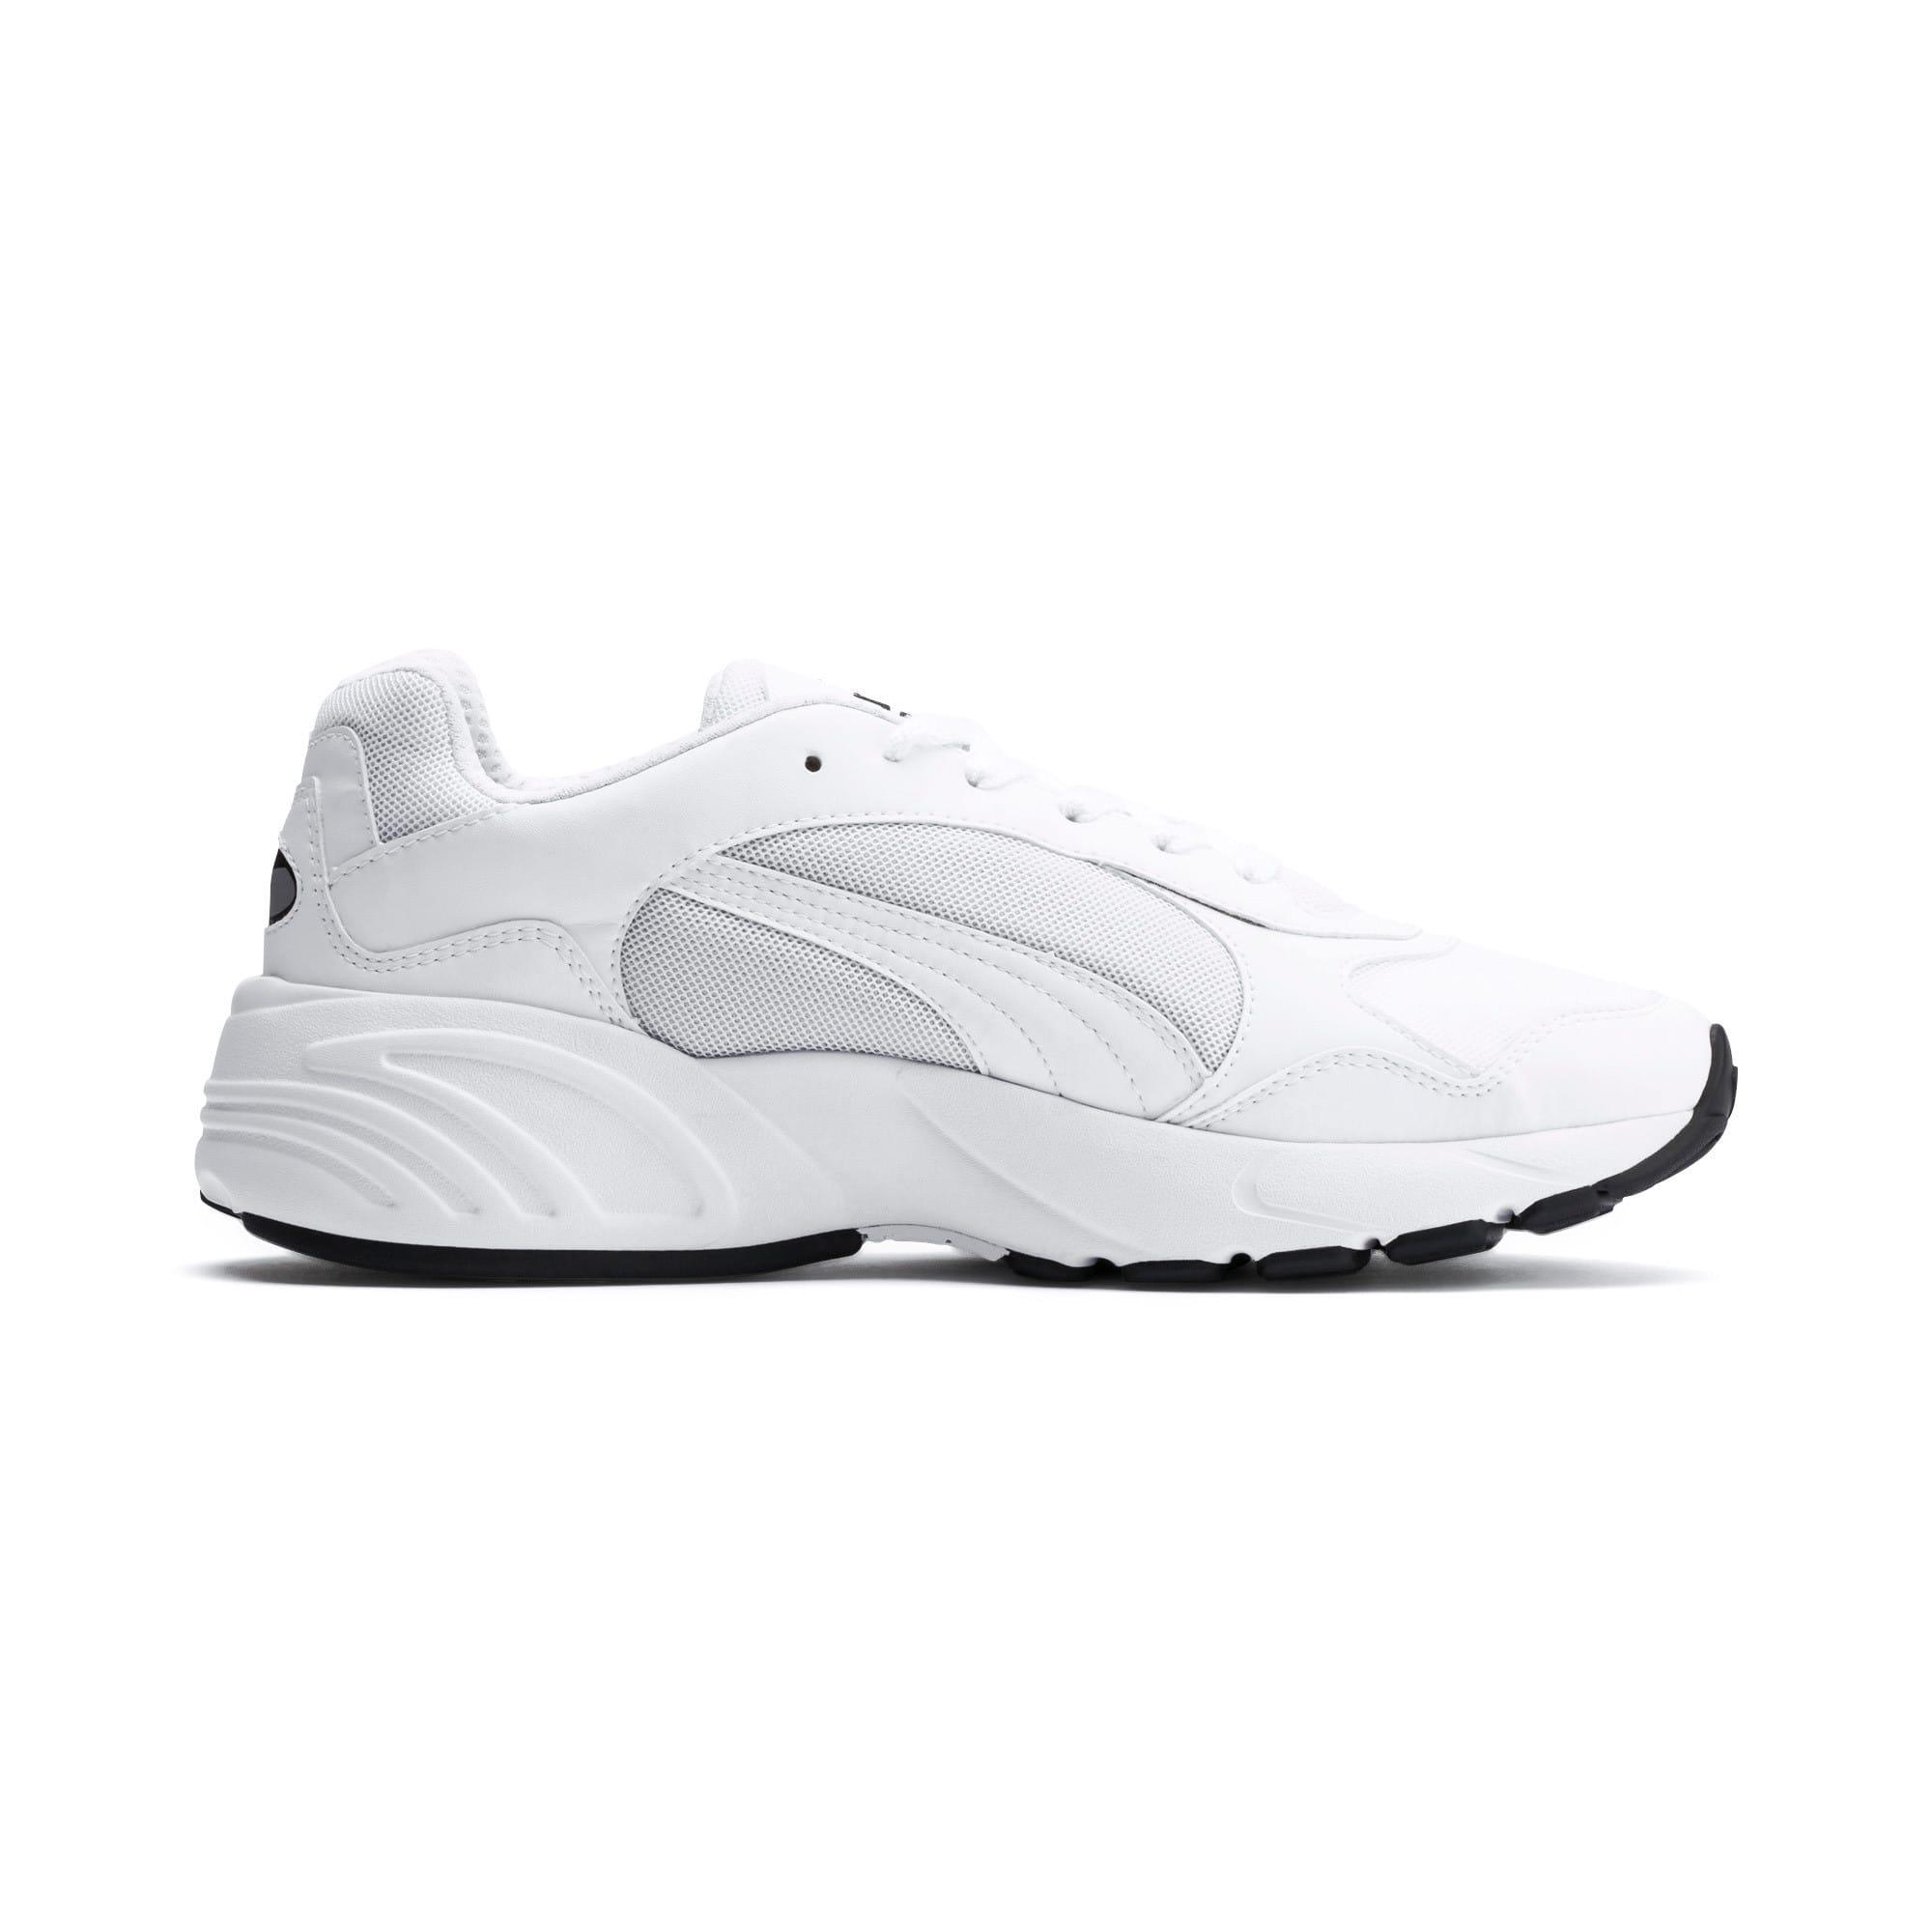 Thumbnail 5 of CELL Viper Sneakers, Puma White-Puma White, medium